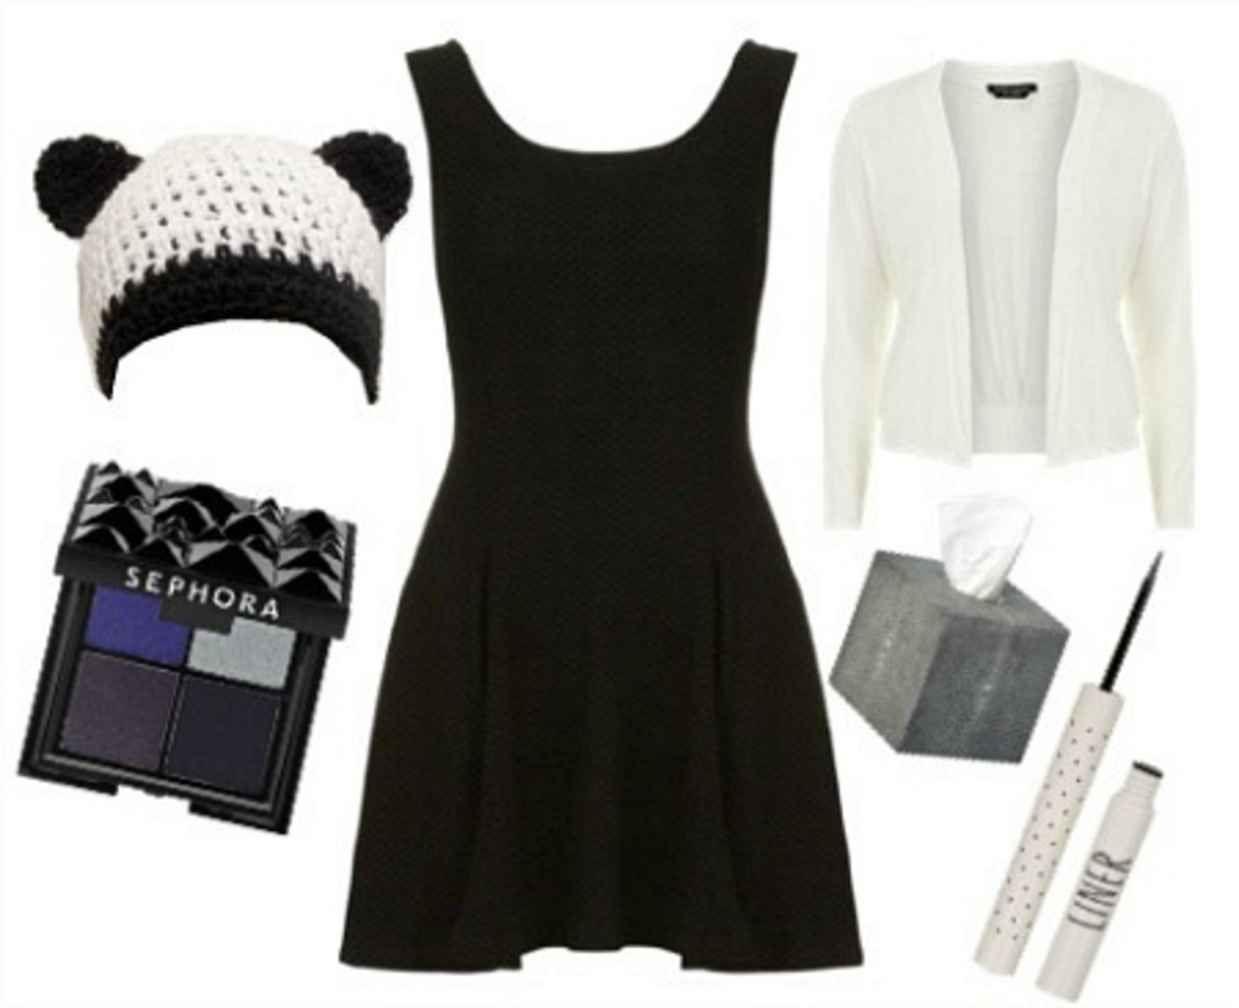 13 little black dress halloween costume ideas | halloween